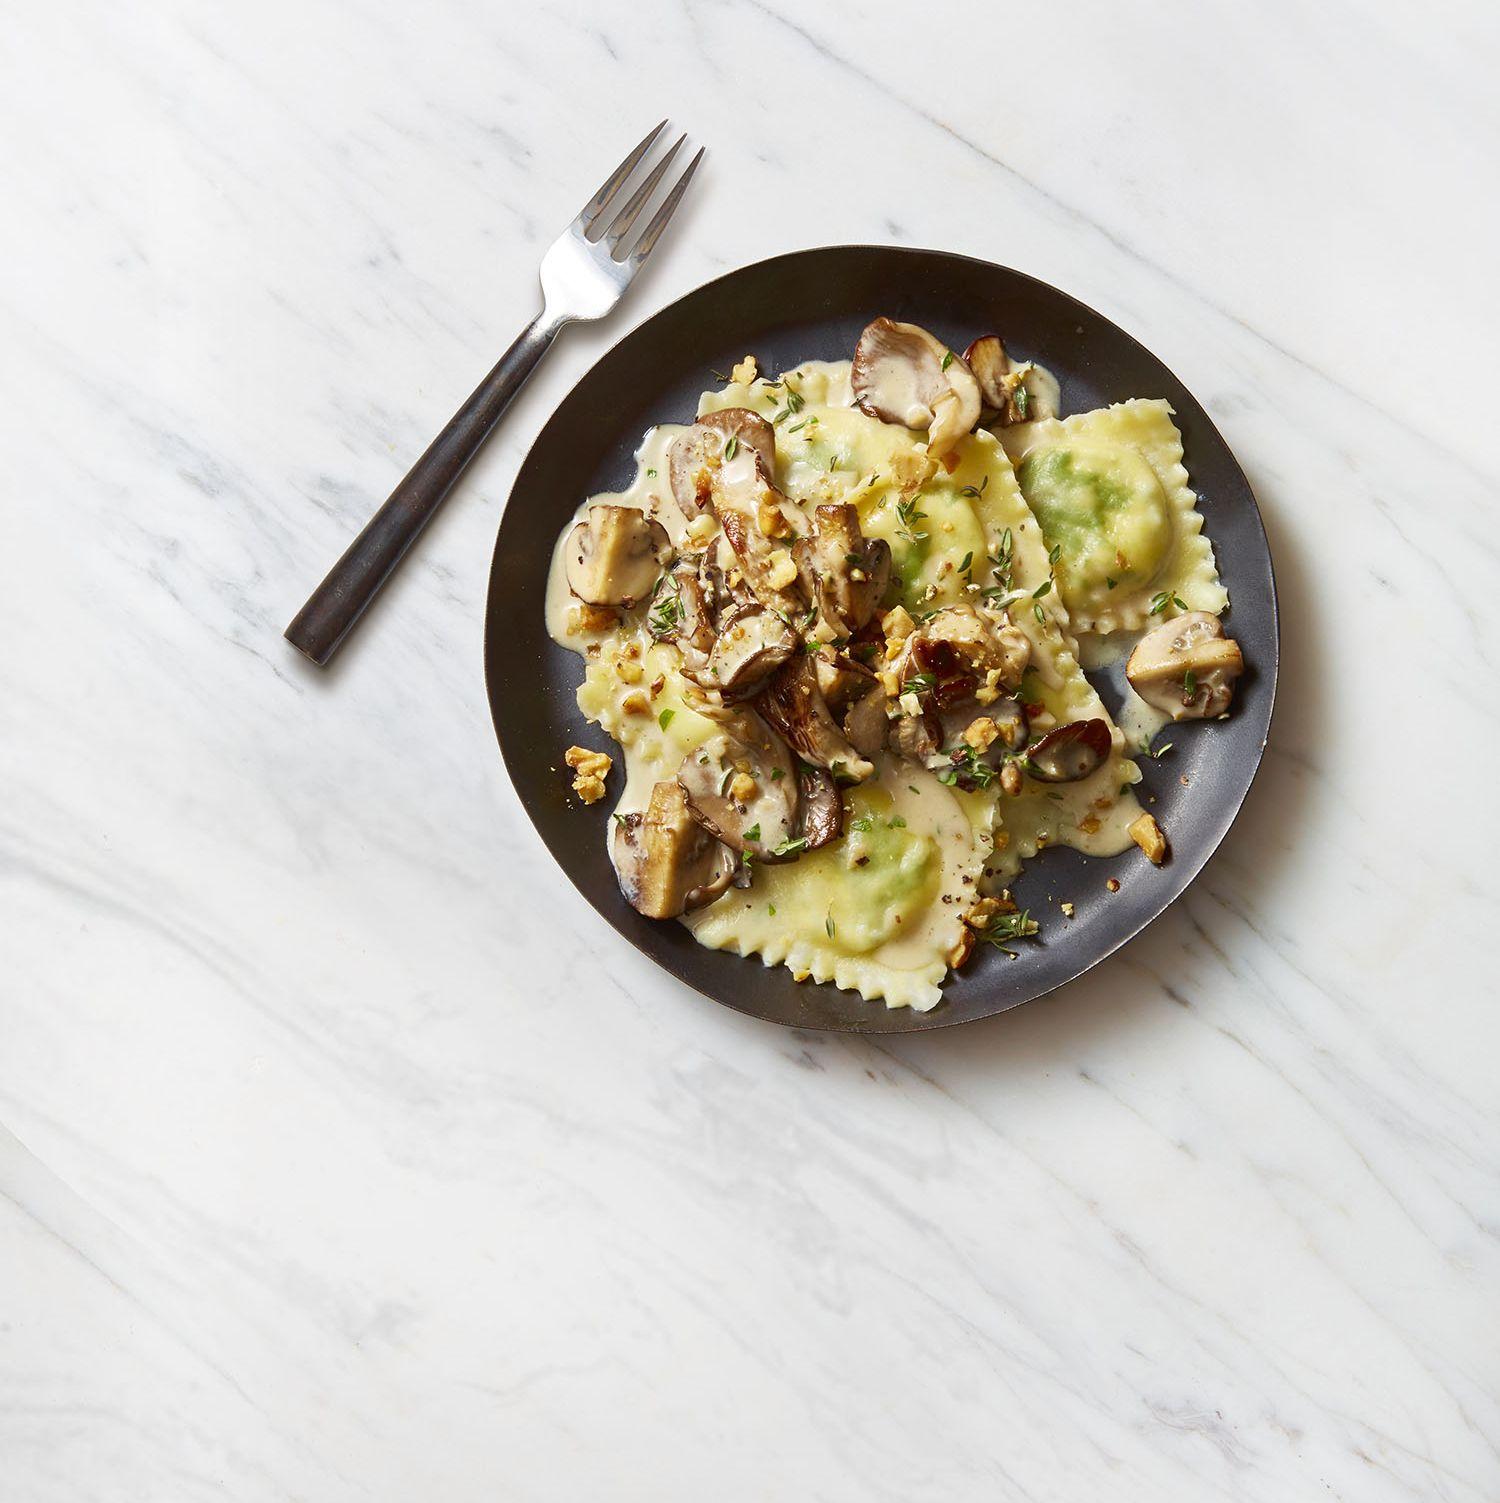 Lemon Ricotta Ravioli with Creamy Herbed Mushrooms